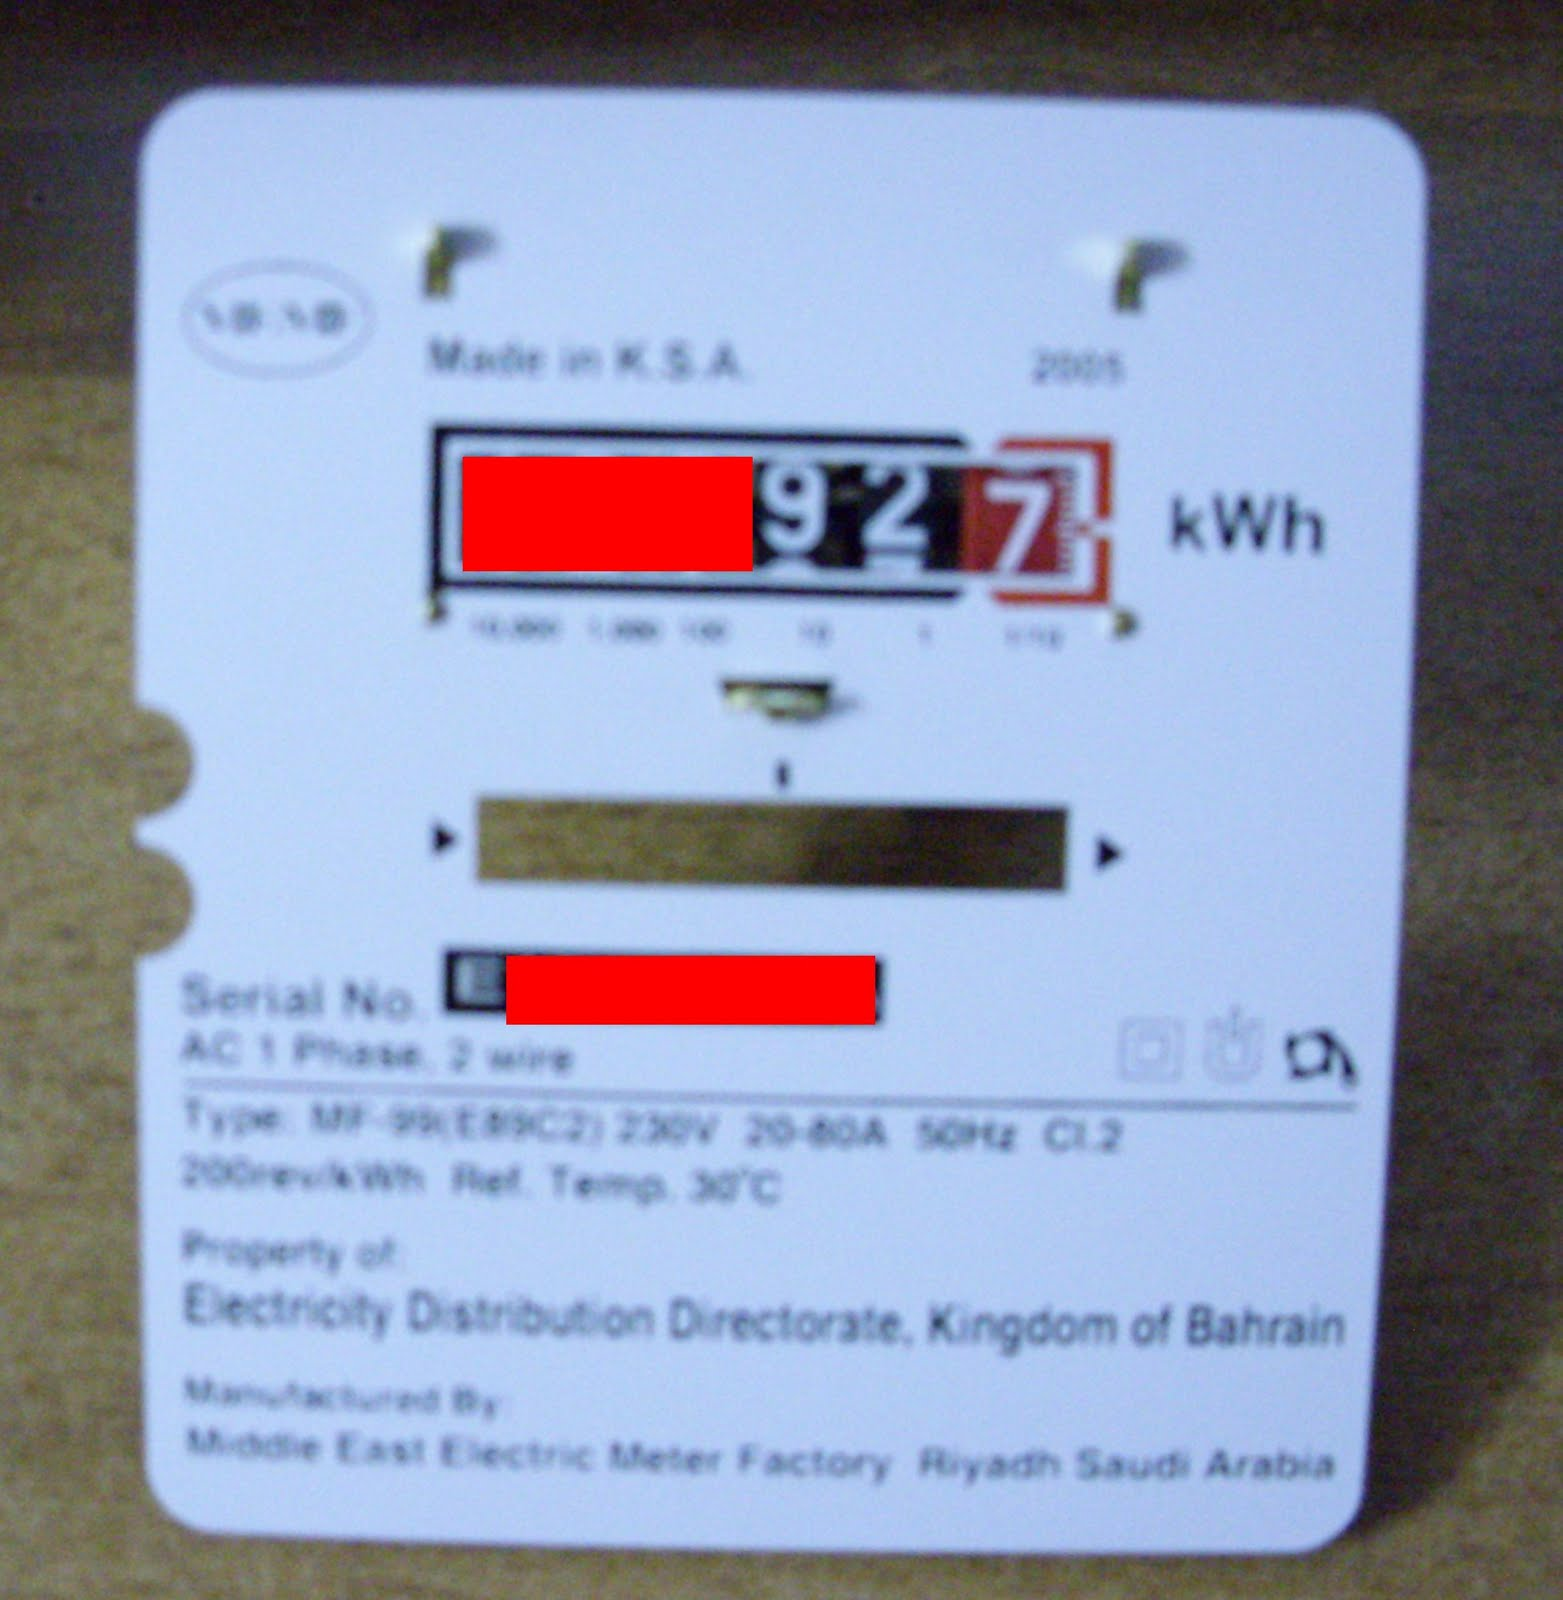 Digital Electric Meter Hacking : Meter hack reveals solar array s true power images frompo